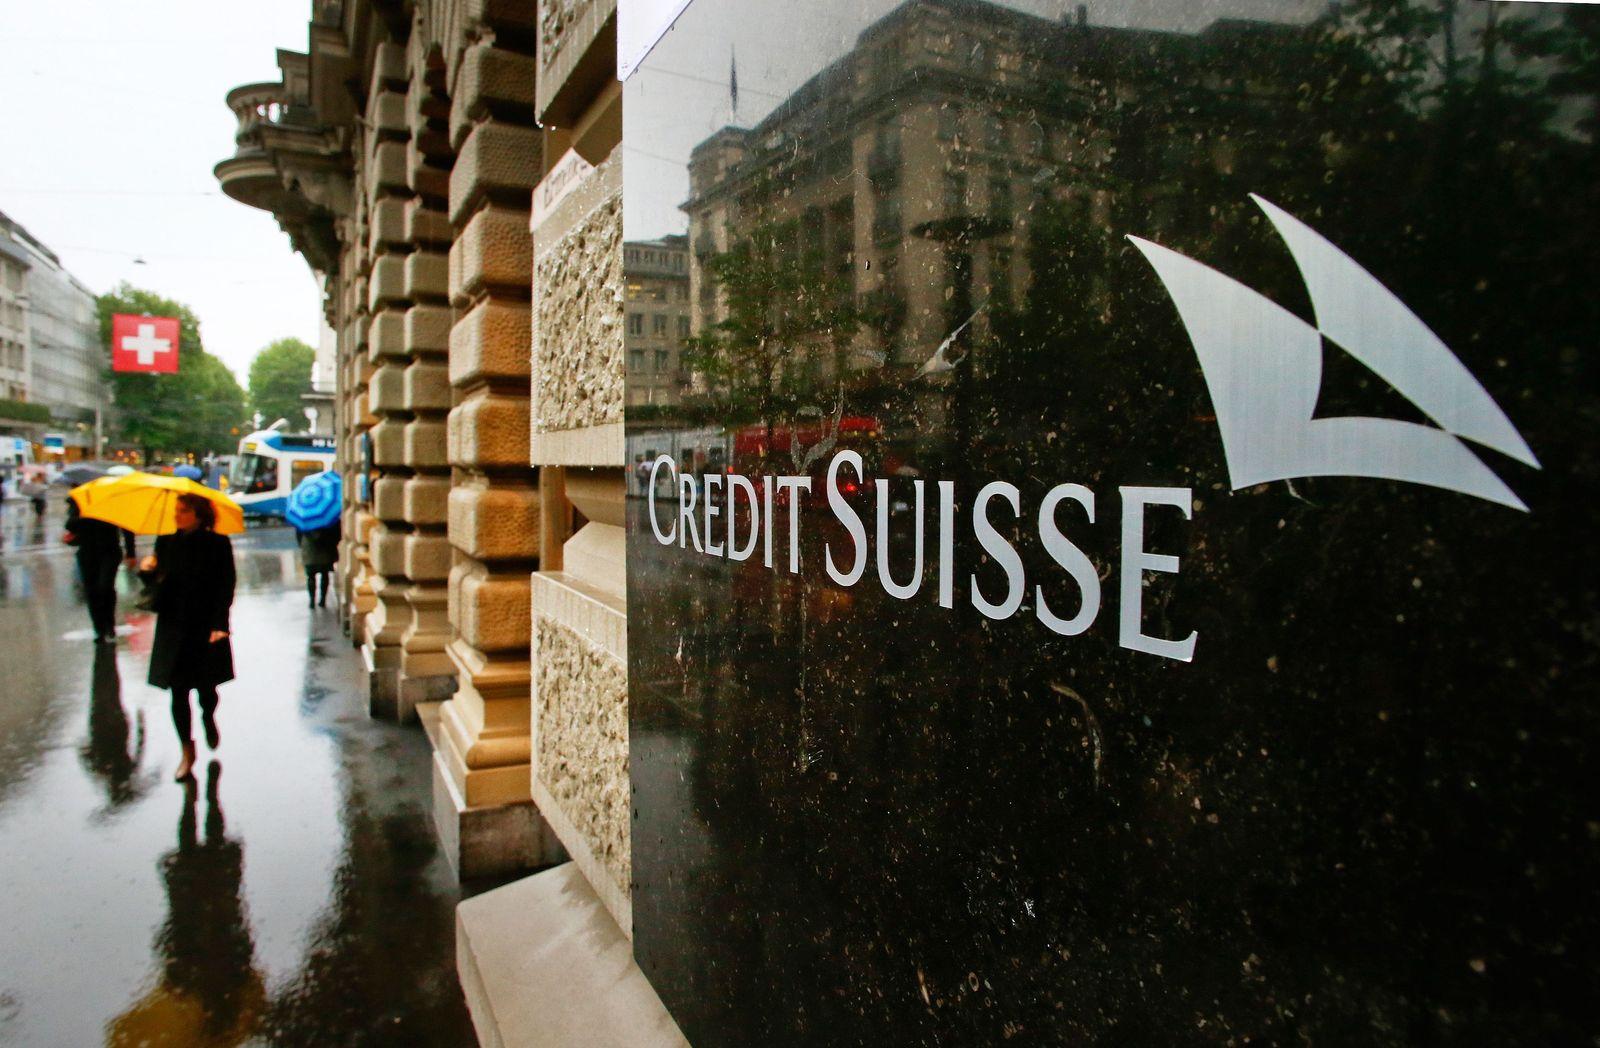 Credit Suisse / Zürich